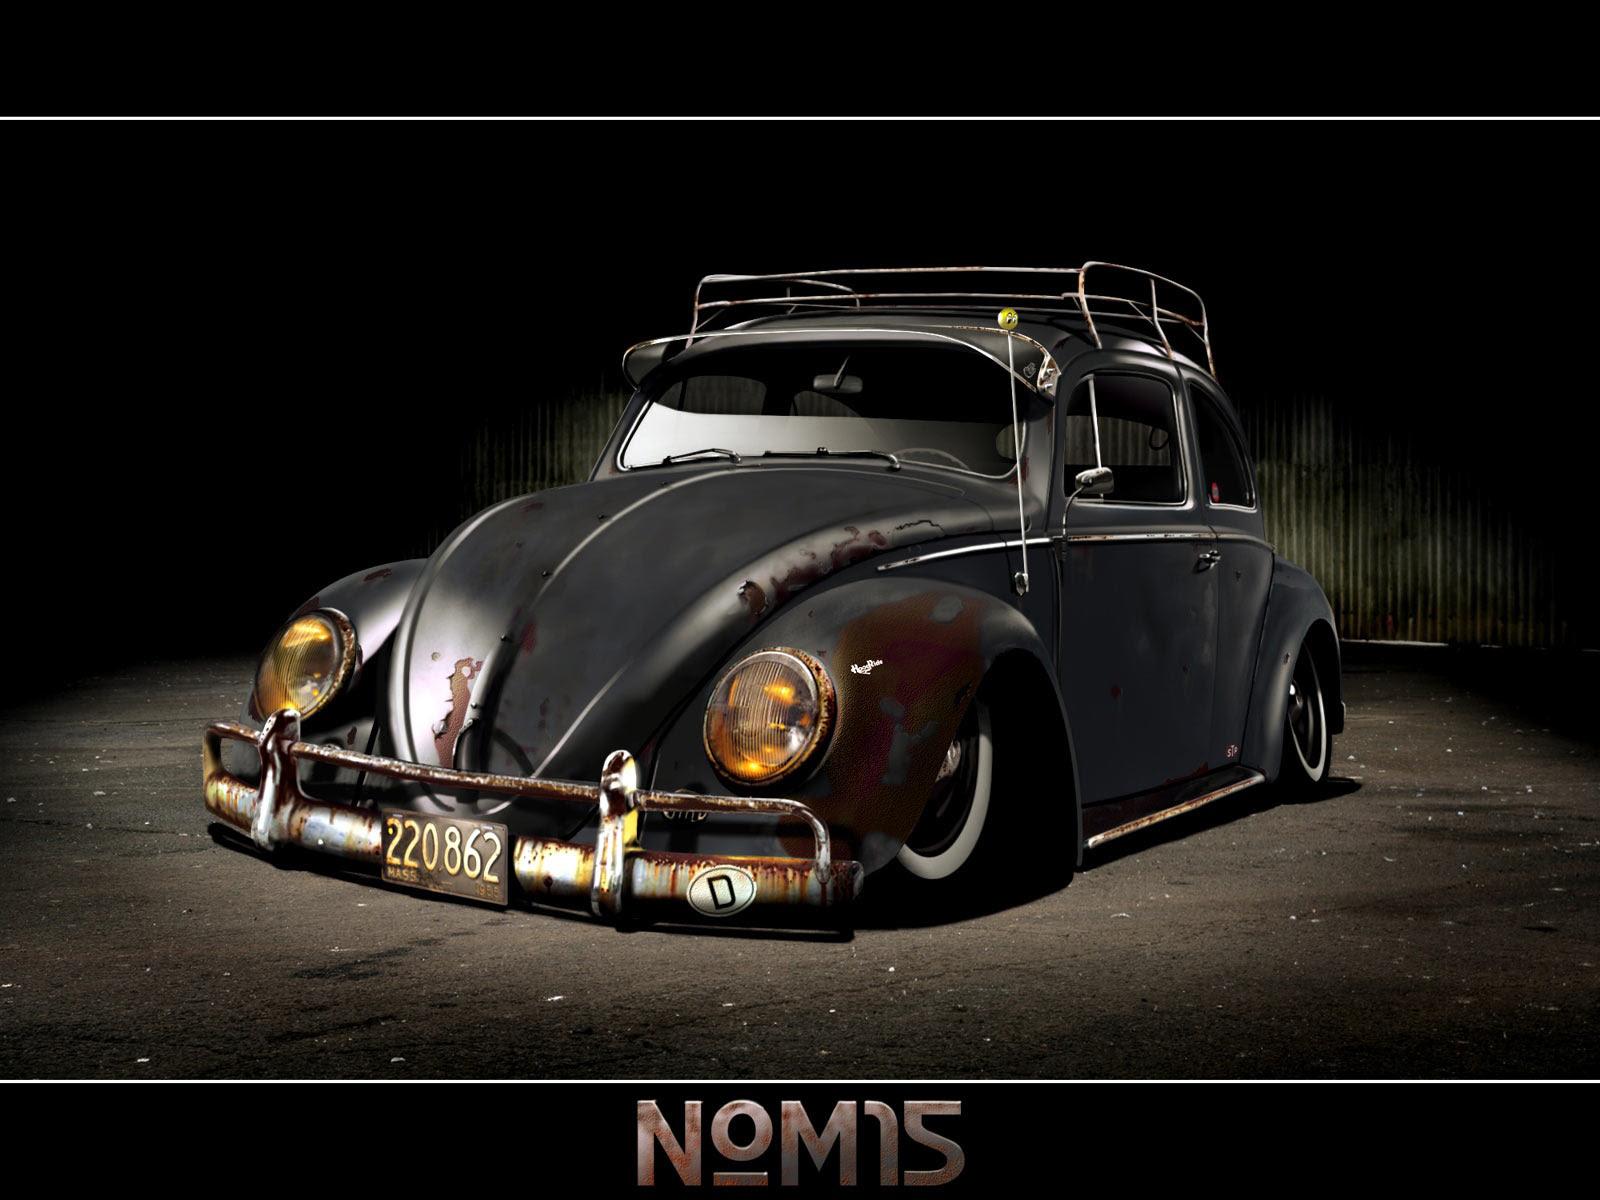 Old Car wallpaper  1600x1200  48166